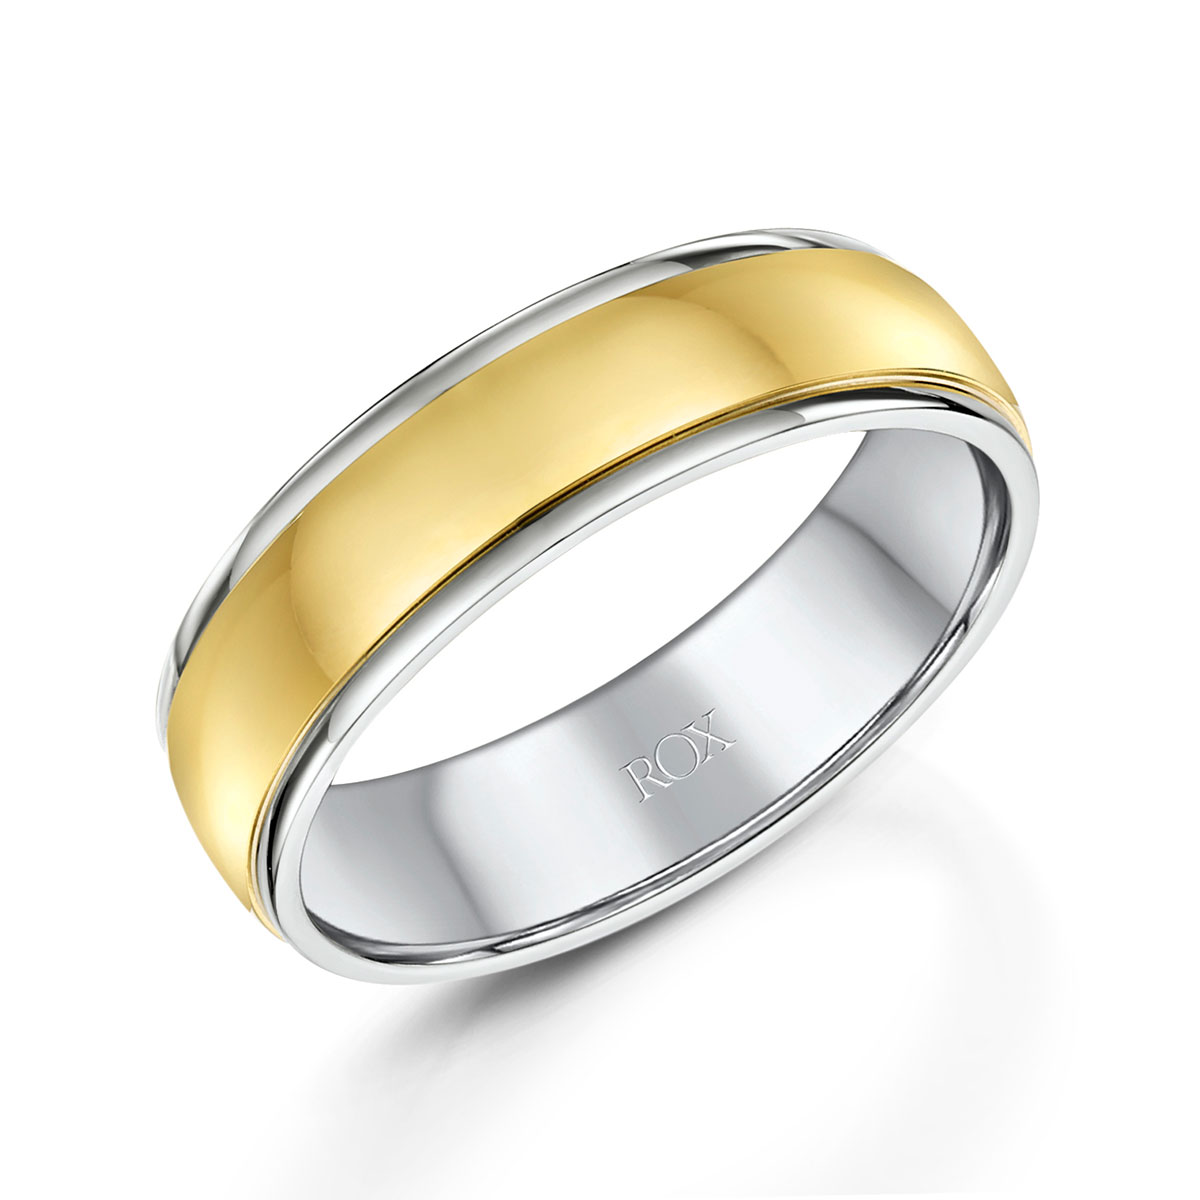 ROX Platinum and Yellow Gold Wedding Ring 6mm